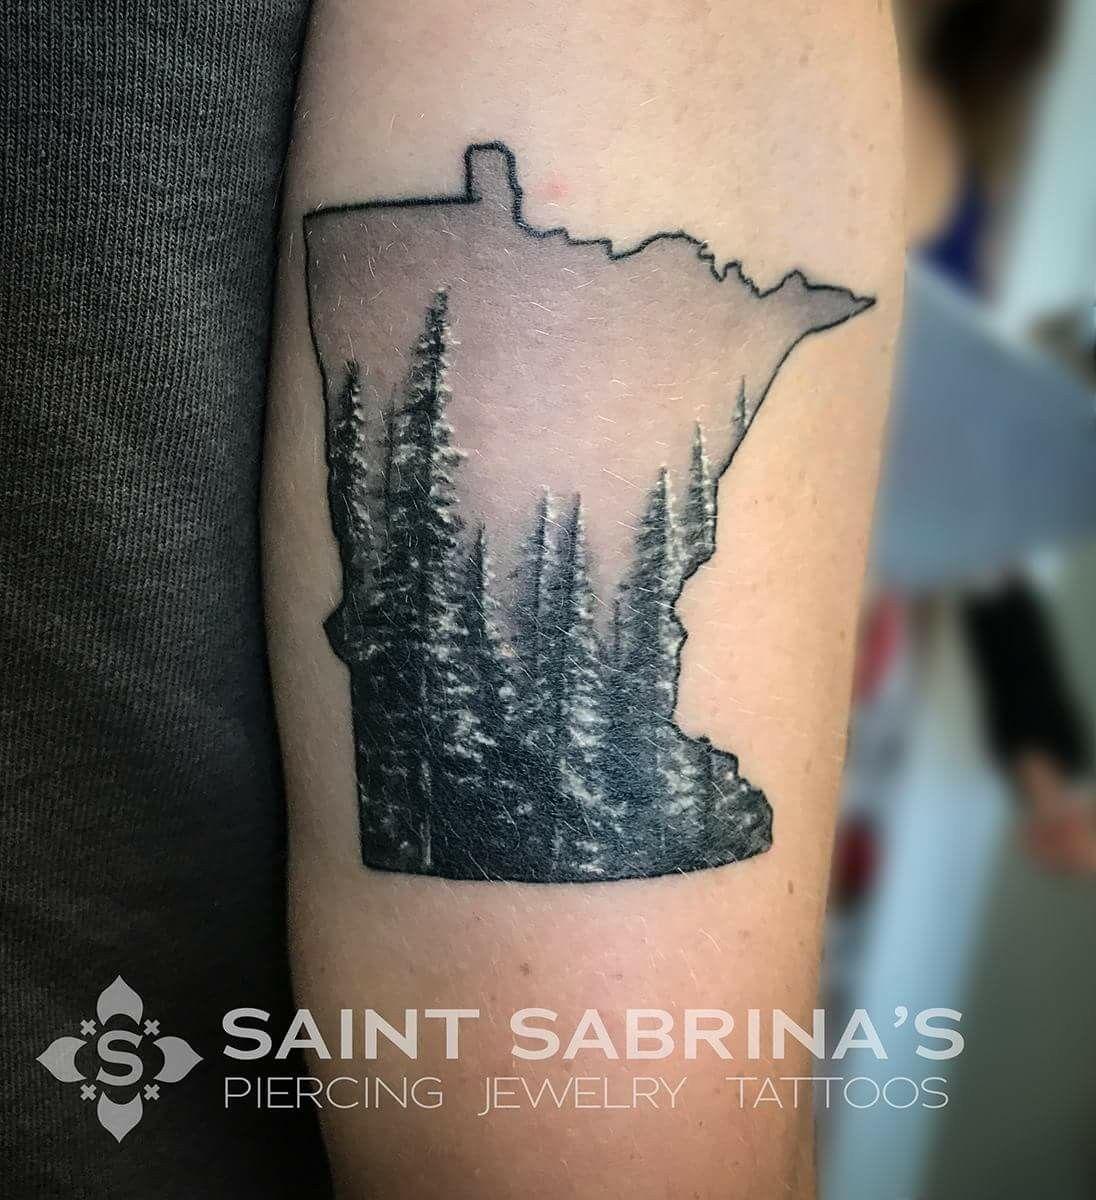 Amazing minnesota tattoo by bleach from saint sabrinas